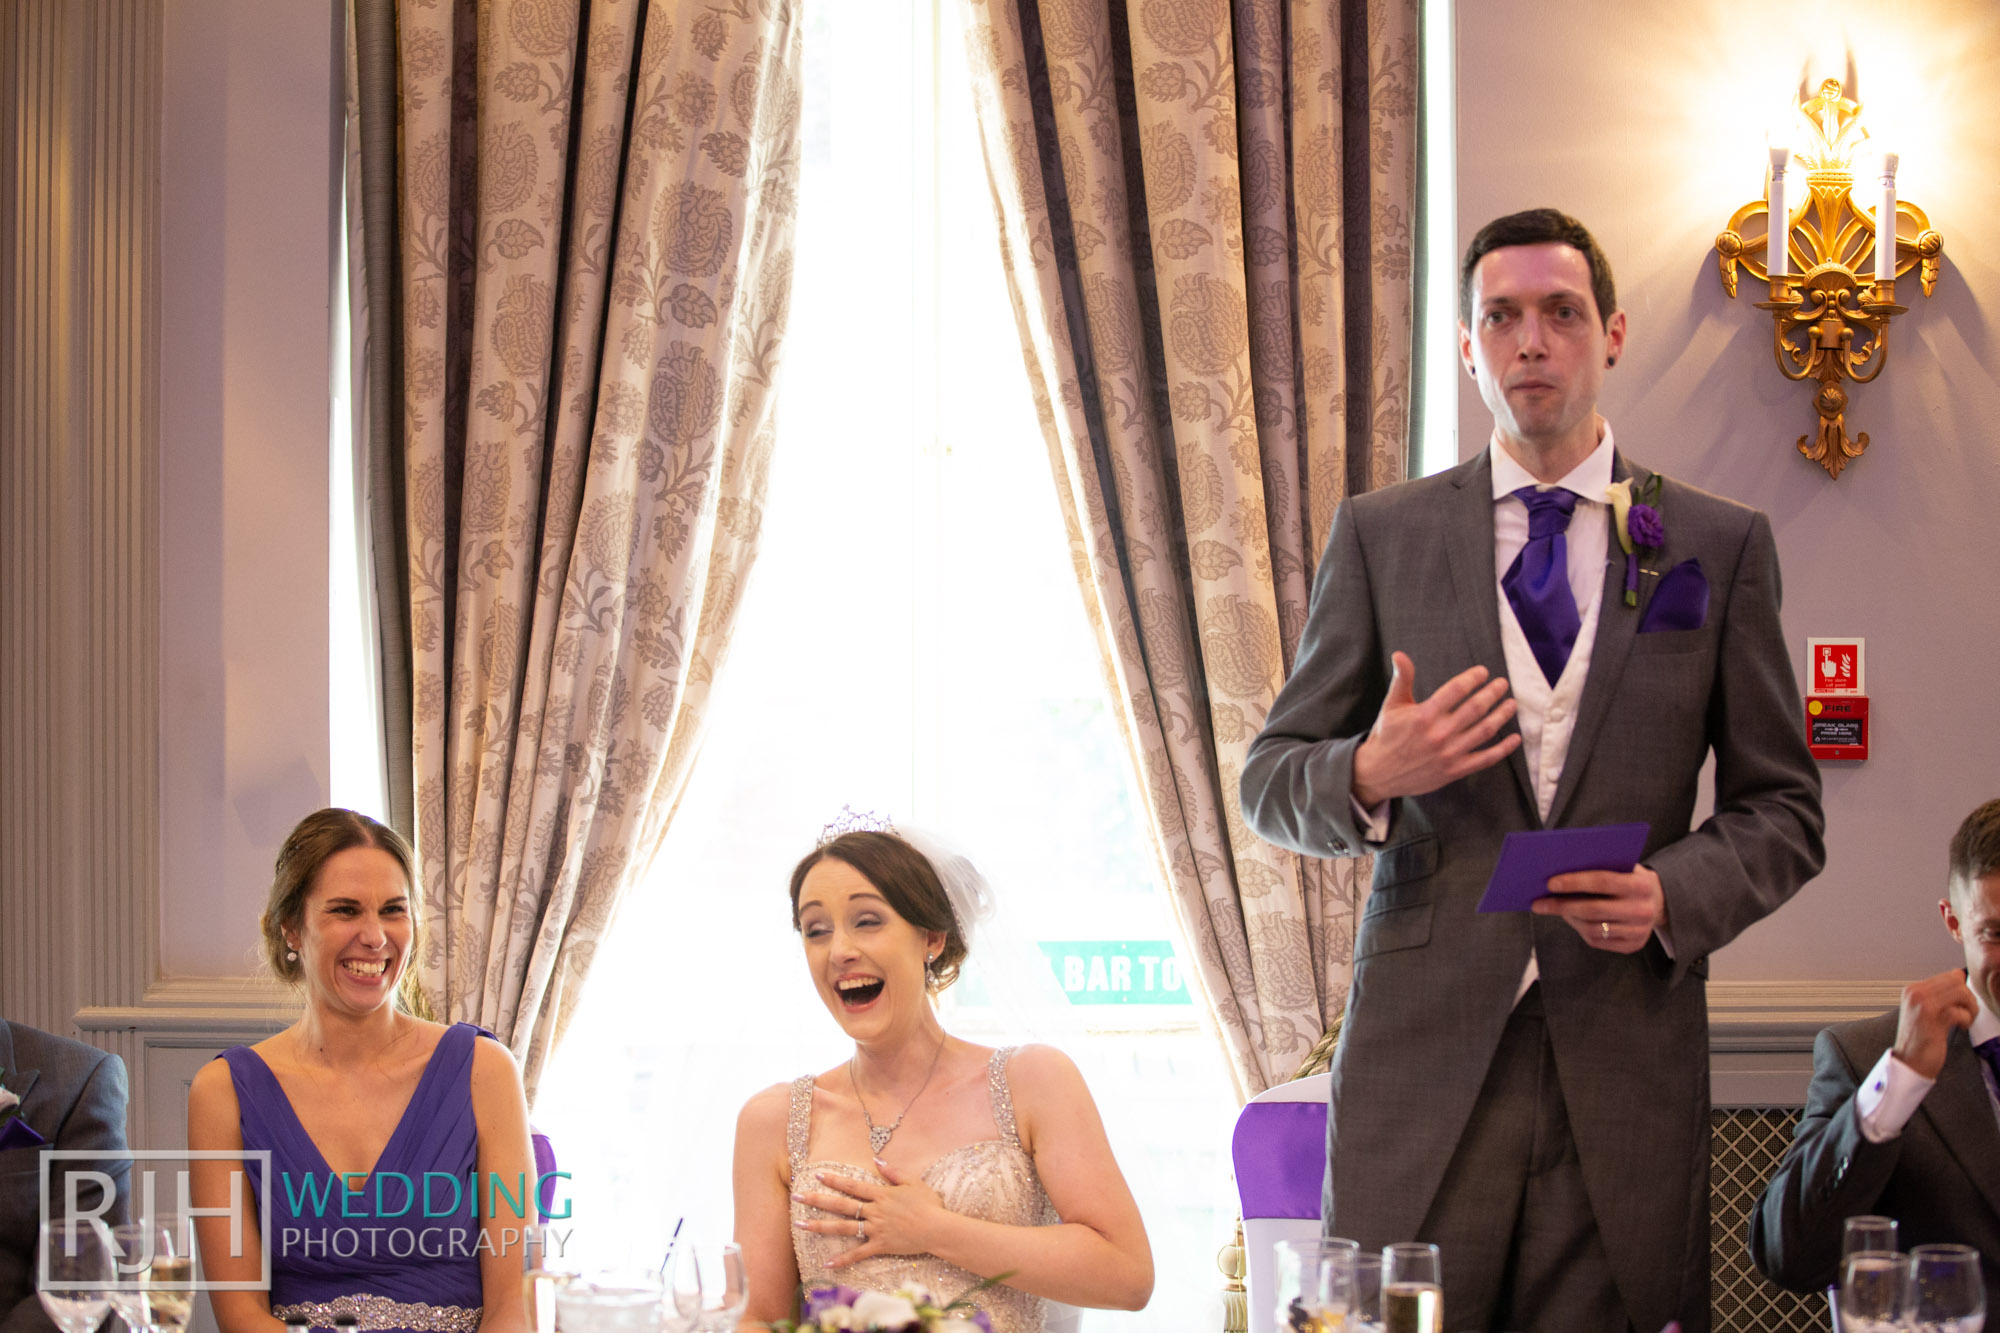 Oulton Hall Wedding Photography_Goodwill-Hall_035_RJH17884.jpg